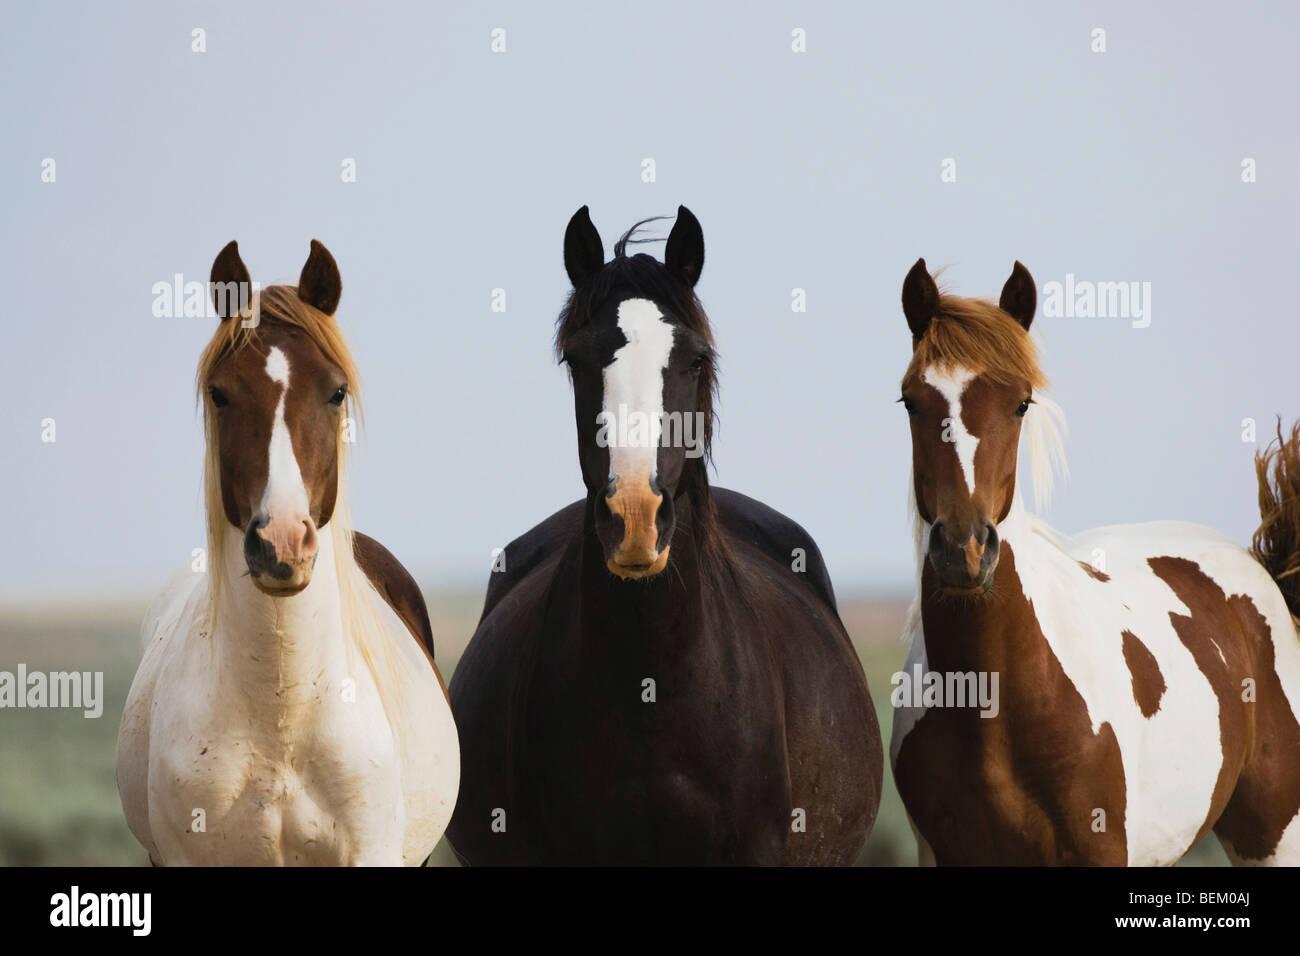 Mustang Horse (Equus caballus), herd, Pryor Mountain Wild Horse Range, Montana, USA - Stock Image